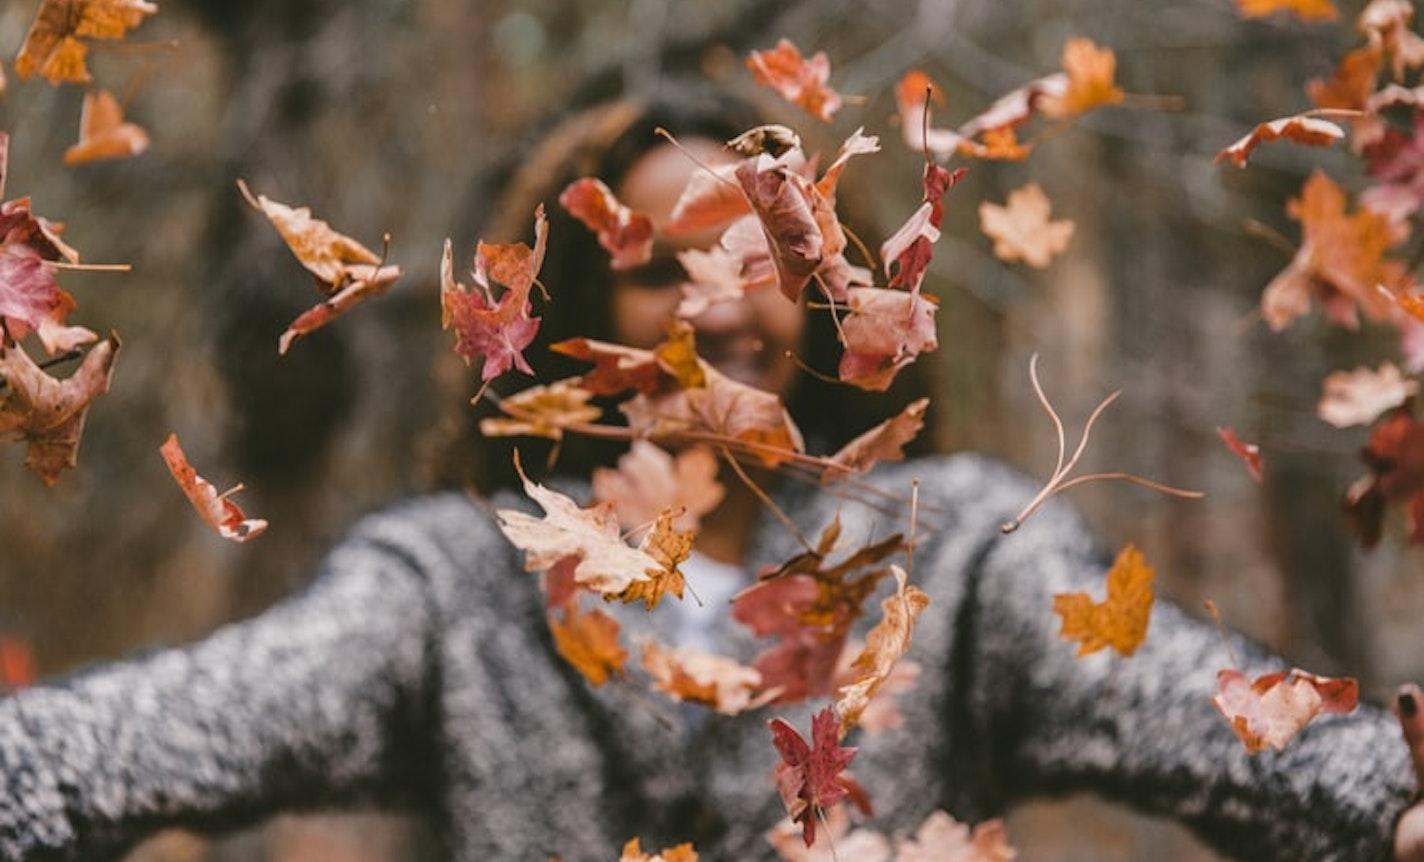 Dancing the New Season:  A Conscious Dance